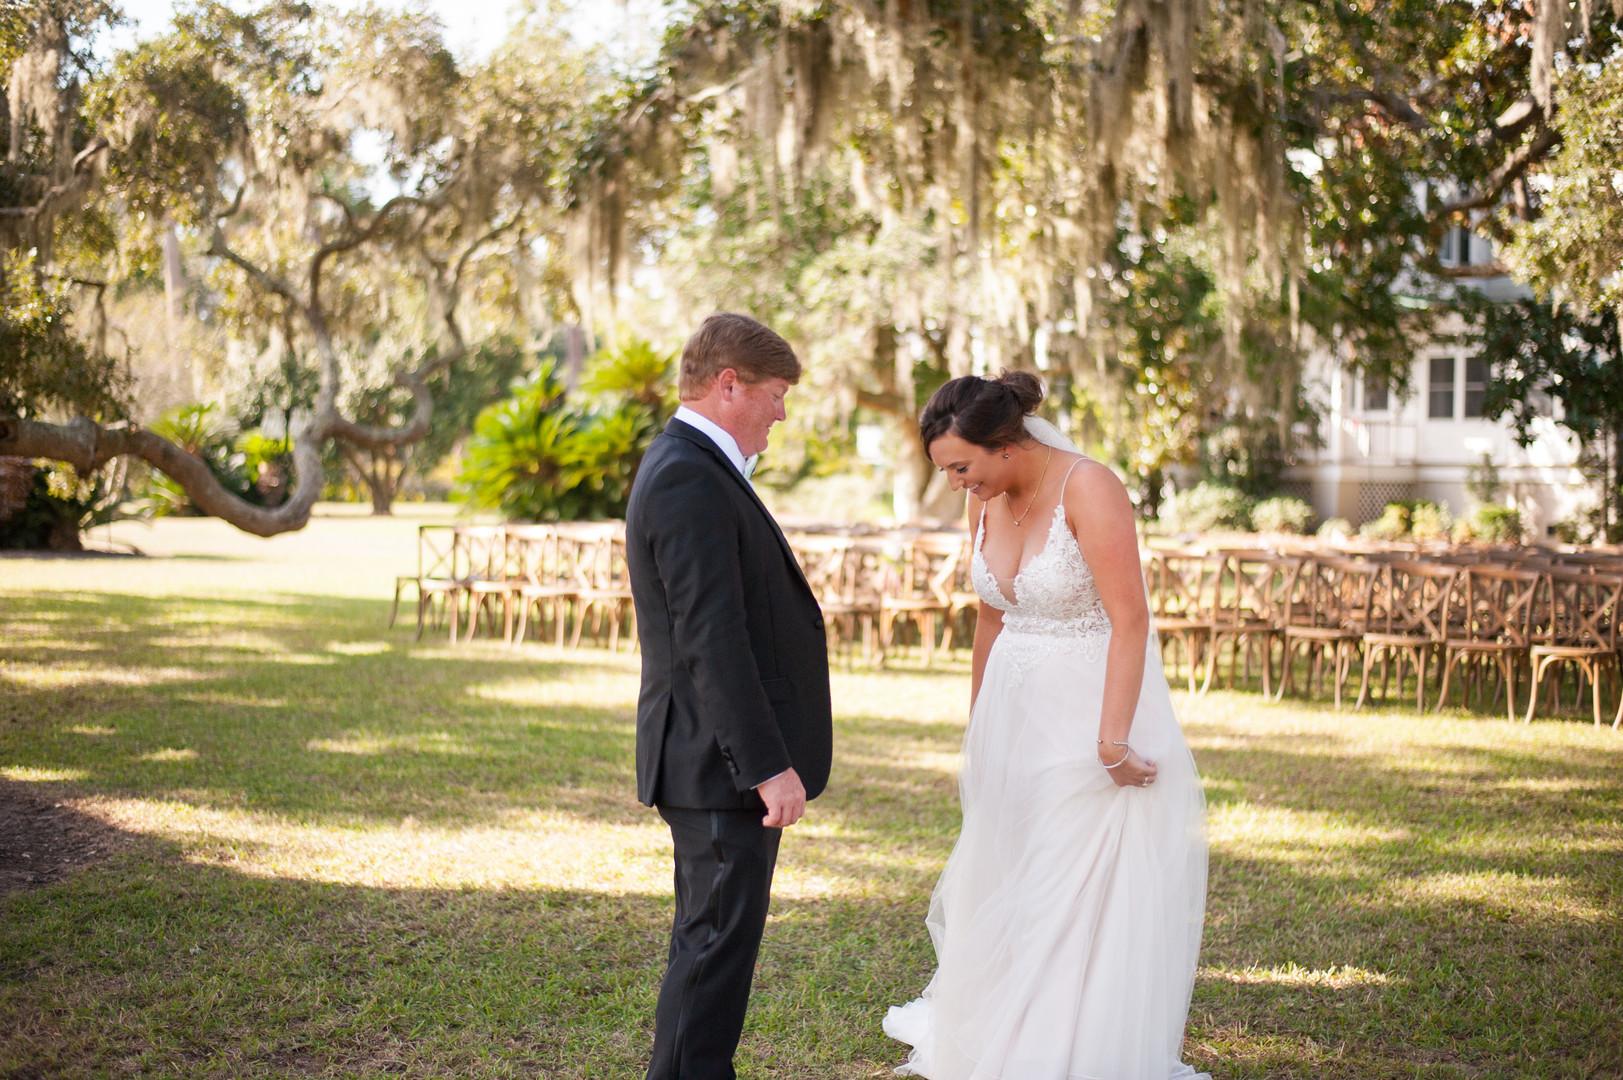 cypress-trees-plantation-wedding-8.jpg